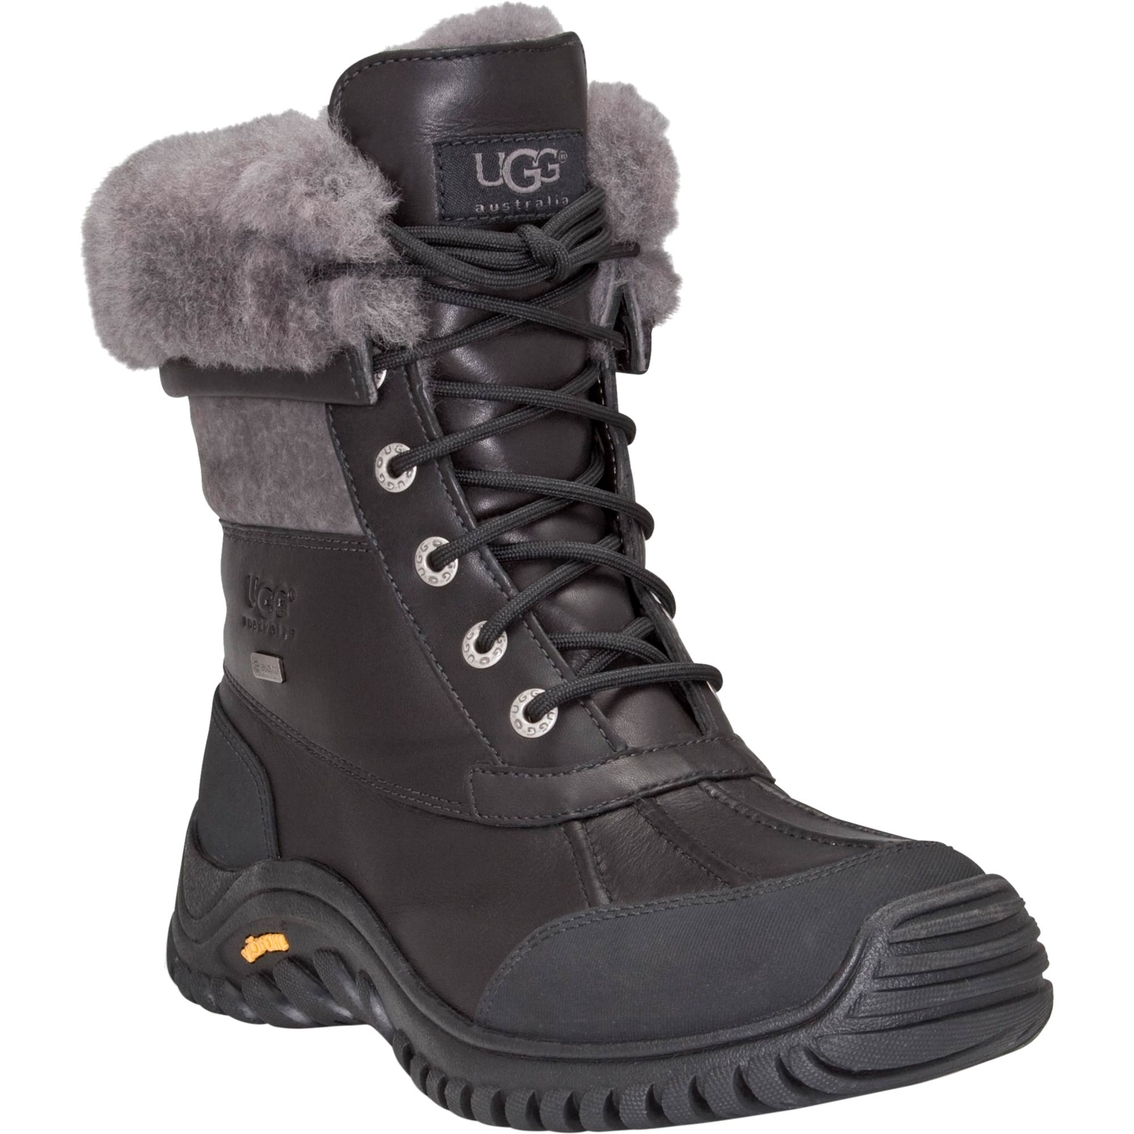 7e50c8e3a03 Ugg Adirondack Ii Cw Fur Boots | Outdoor | Shoes | Shop The Exchange